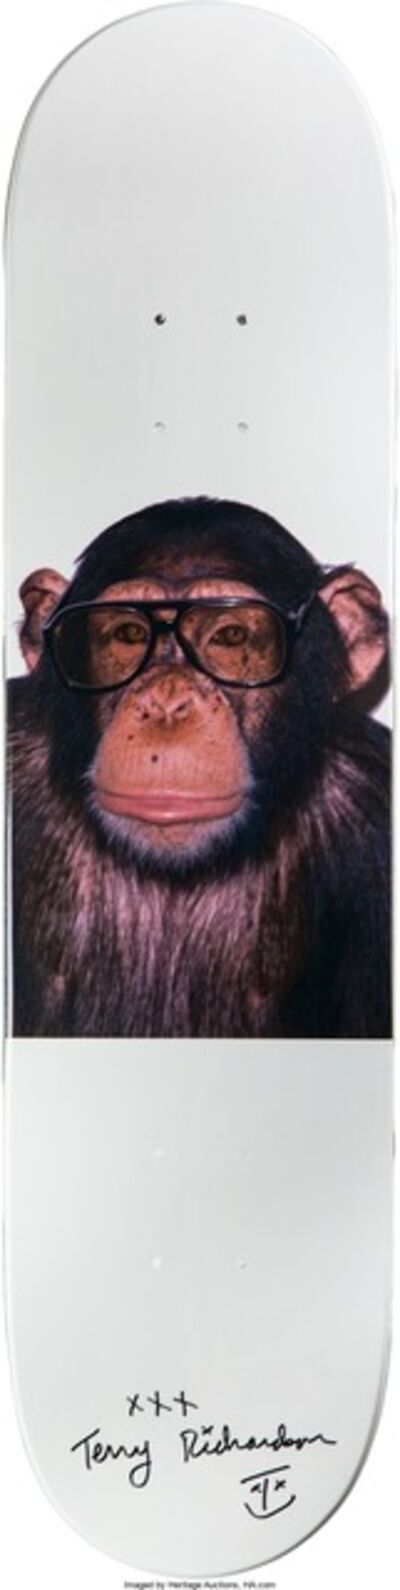 Terry Richardson, 'Monkey'